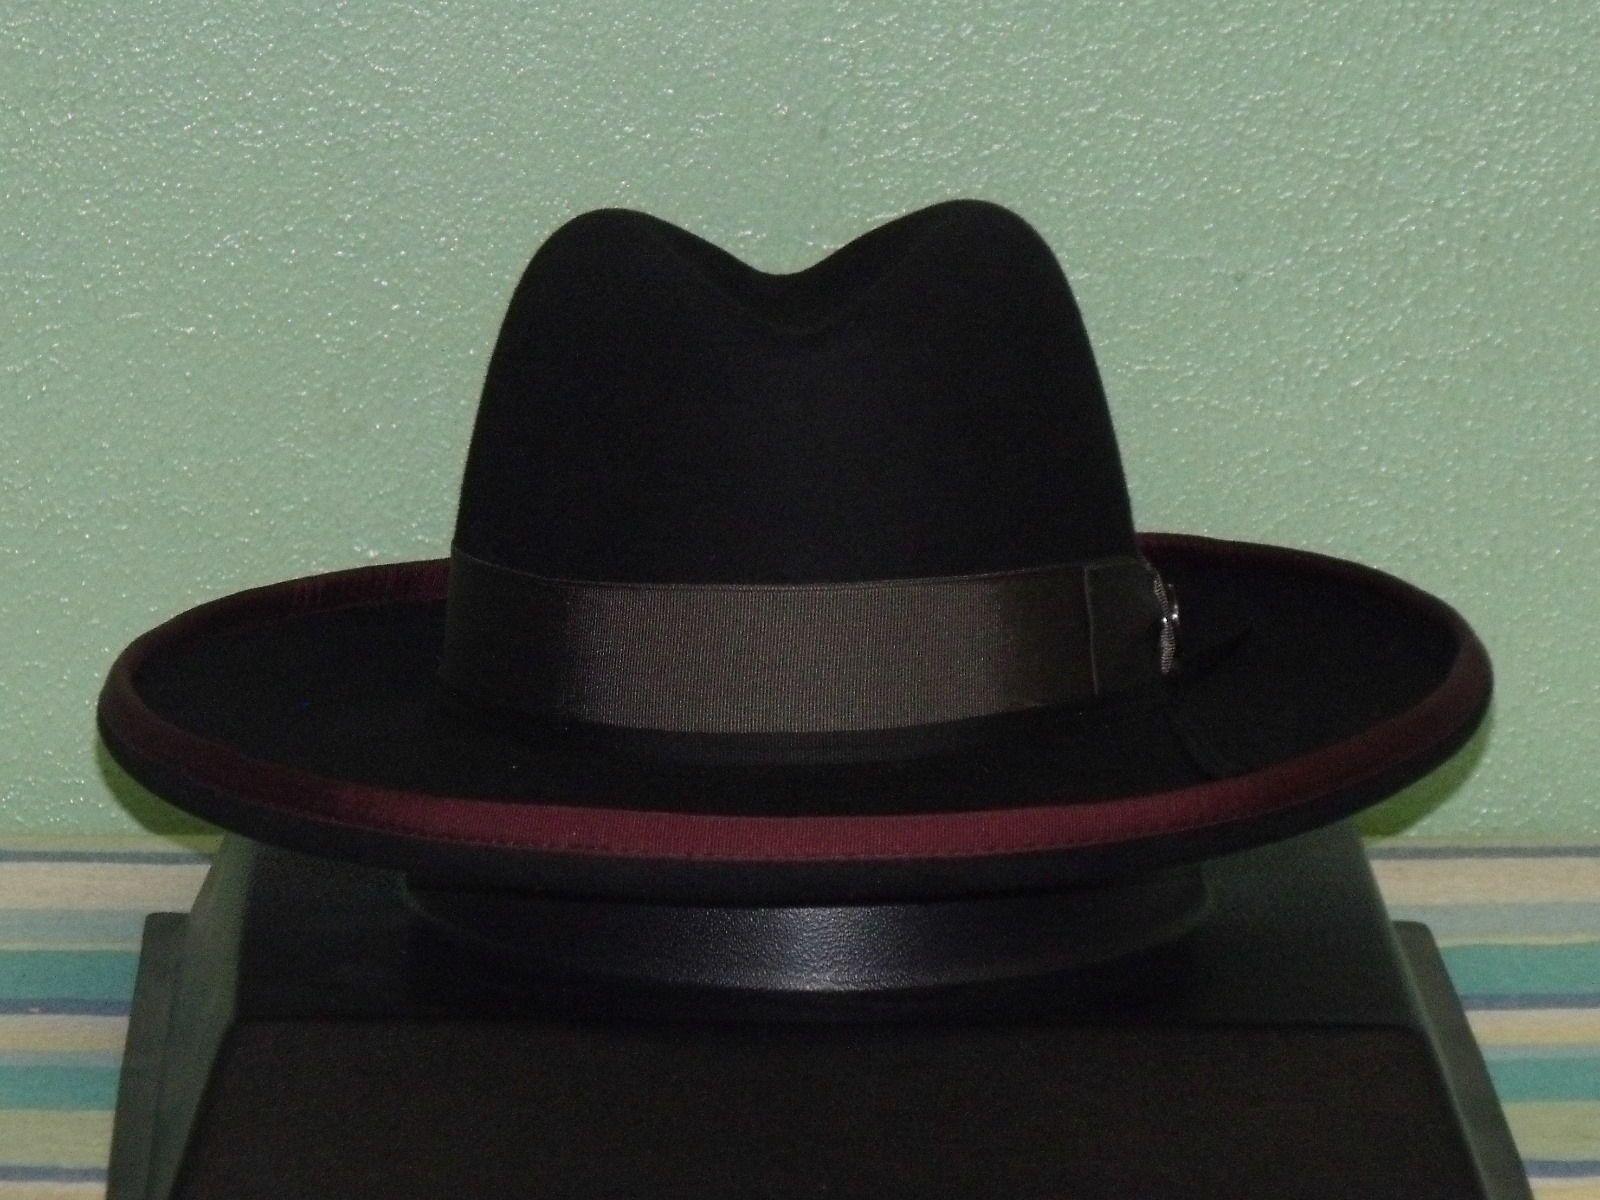 Stetson west bound b rolled brim royal deluxe fur felt fedora hat ... 9897e71712c